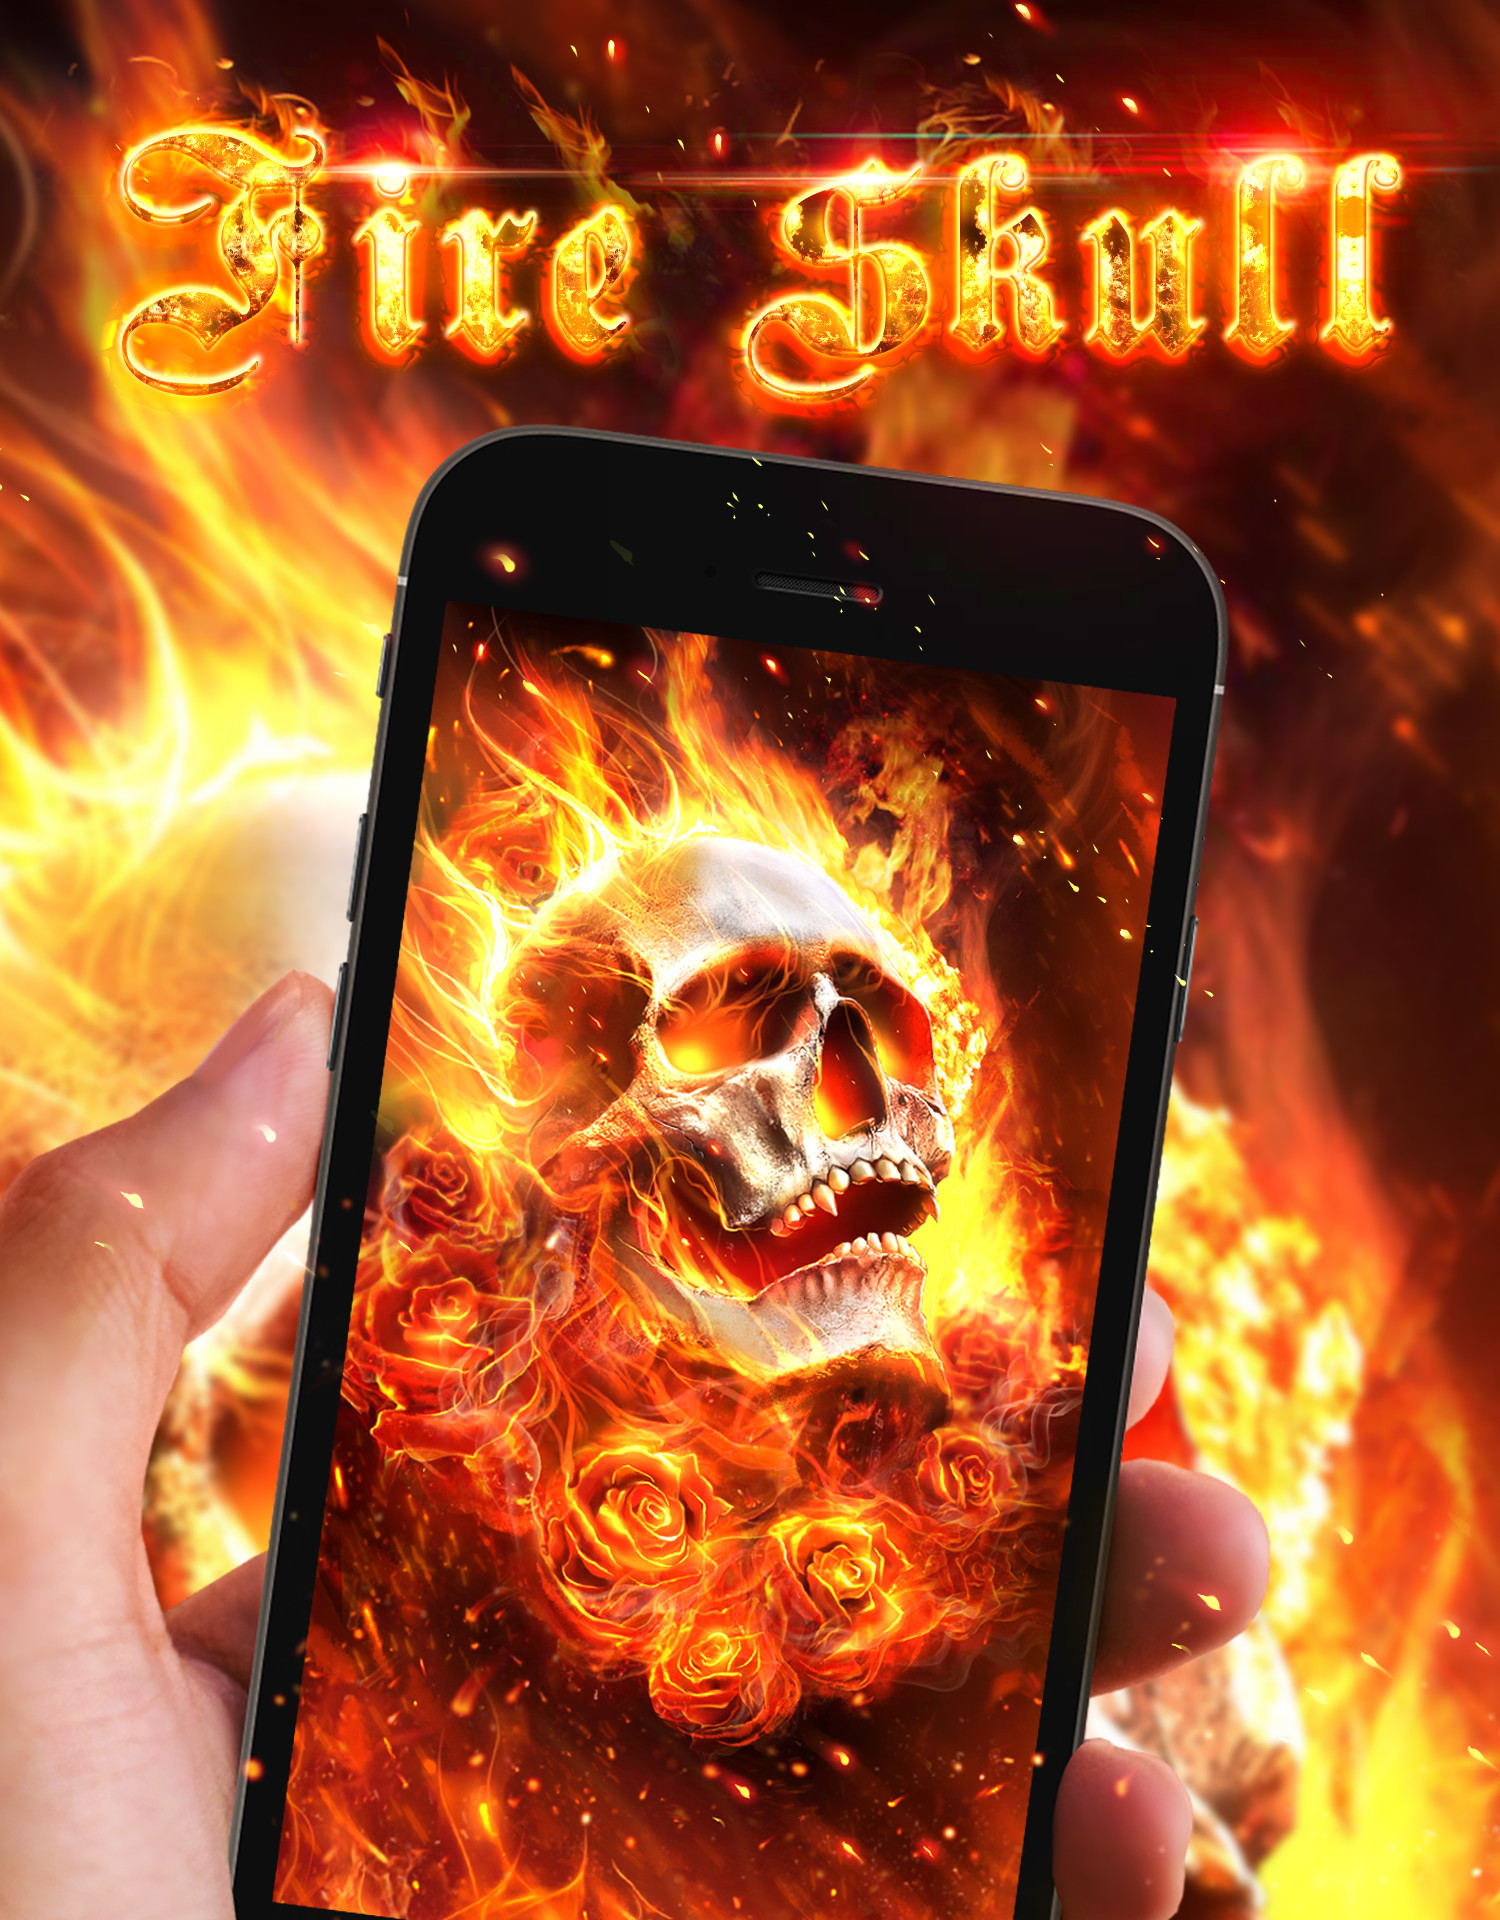 Cool fire skull live wallpaper!